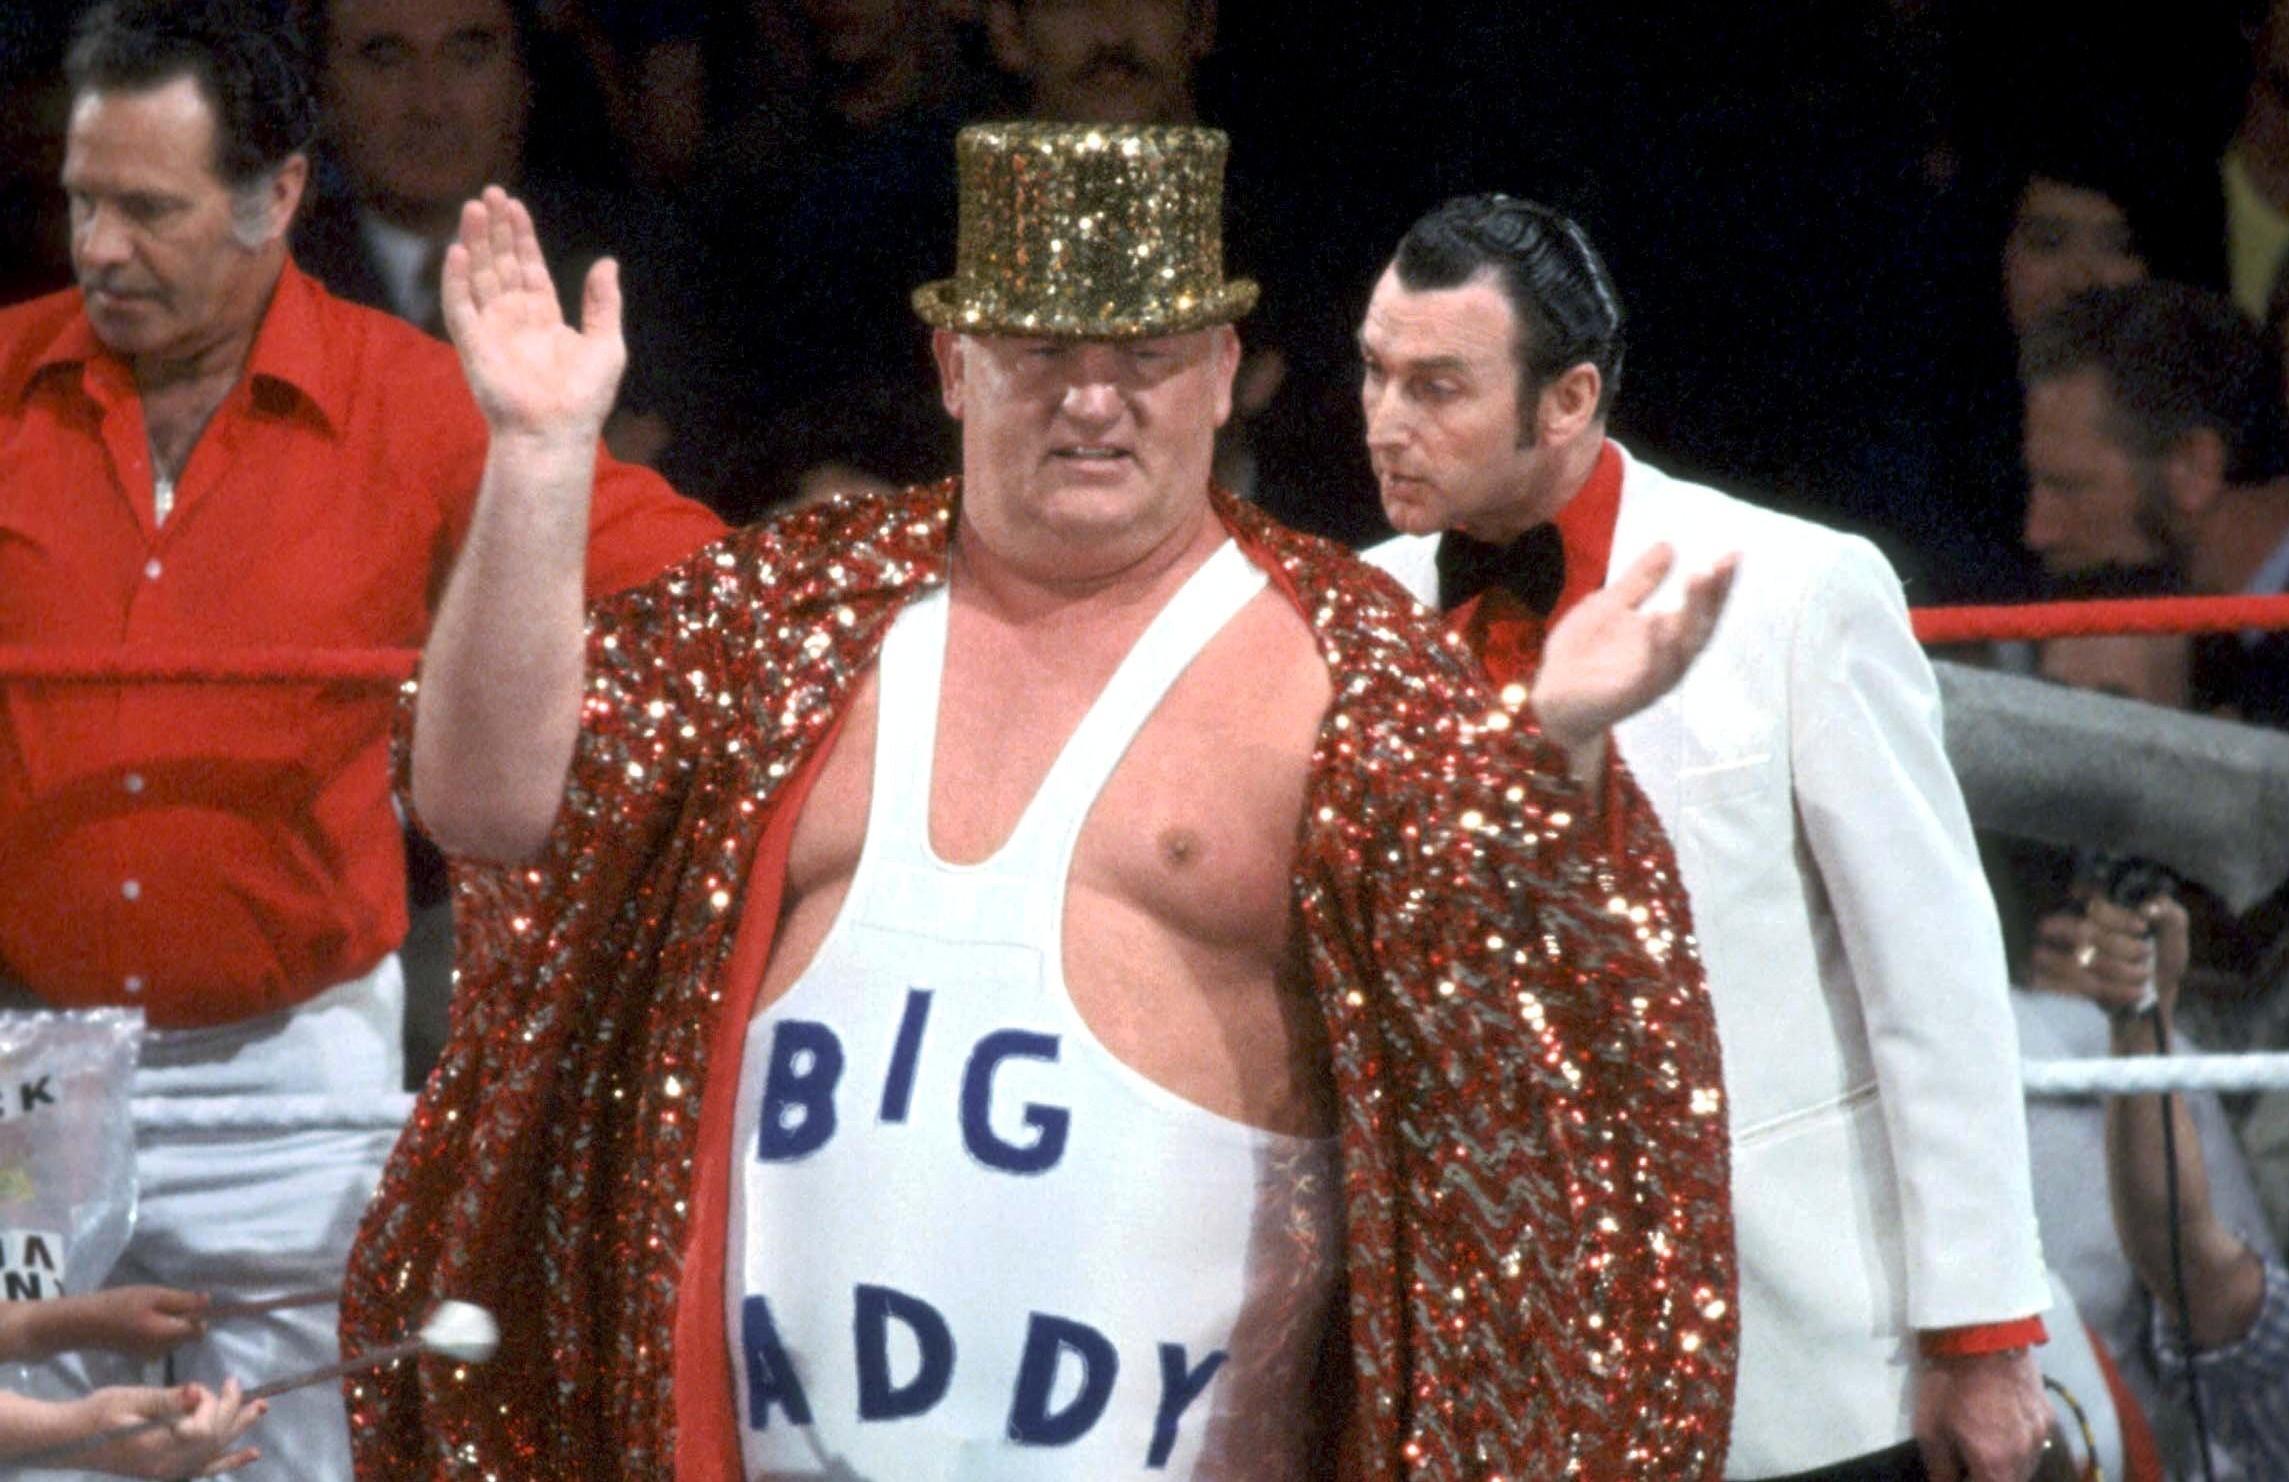 Big Daddy (REX/Shutterstock)